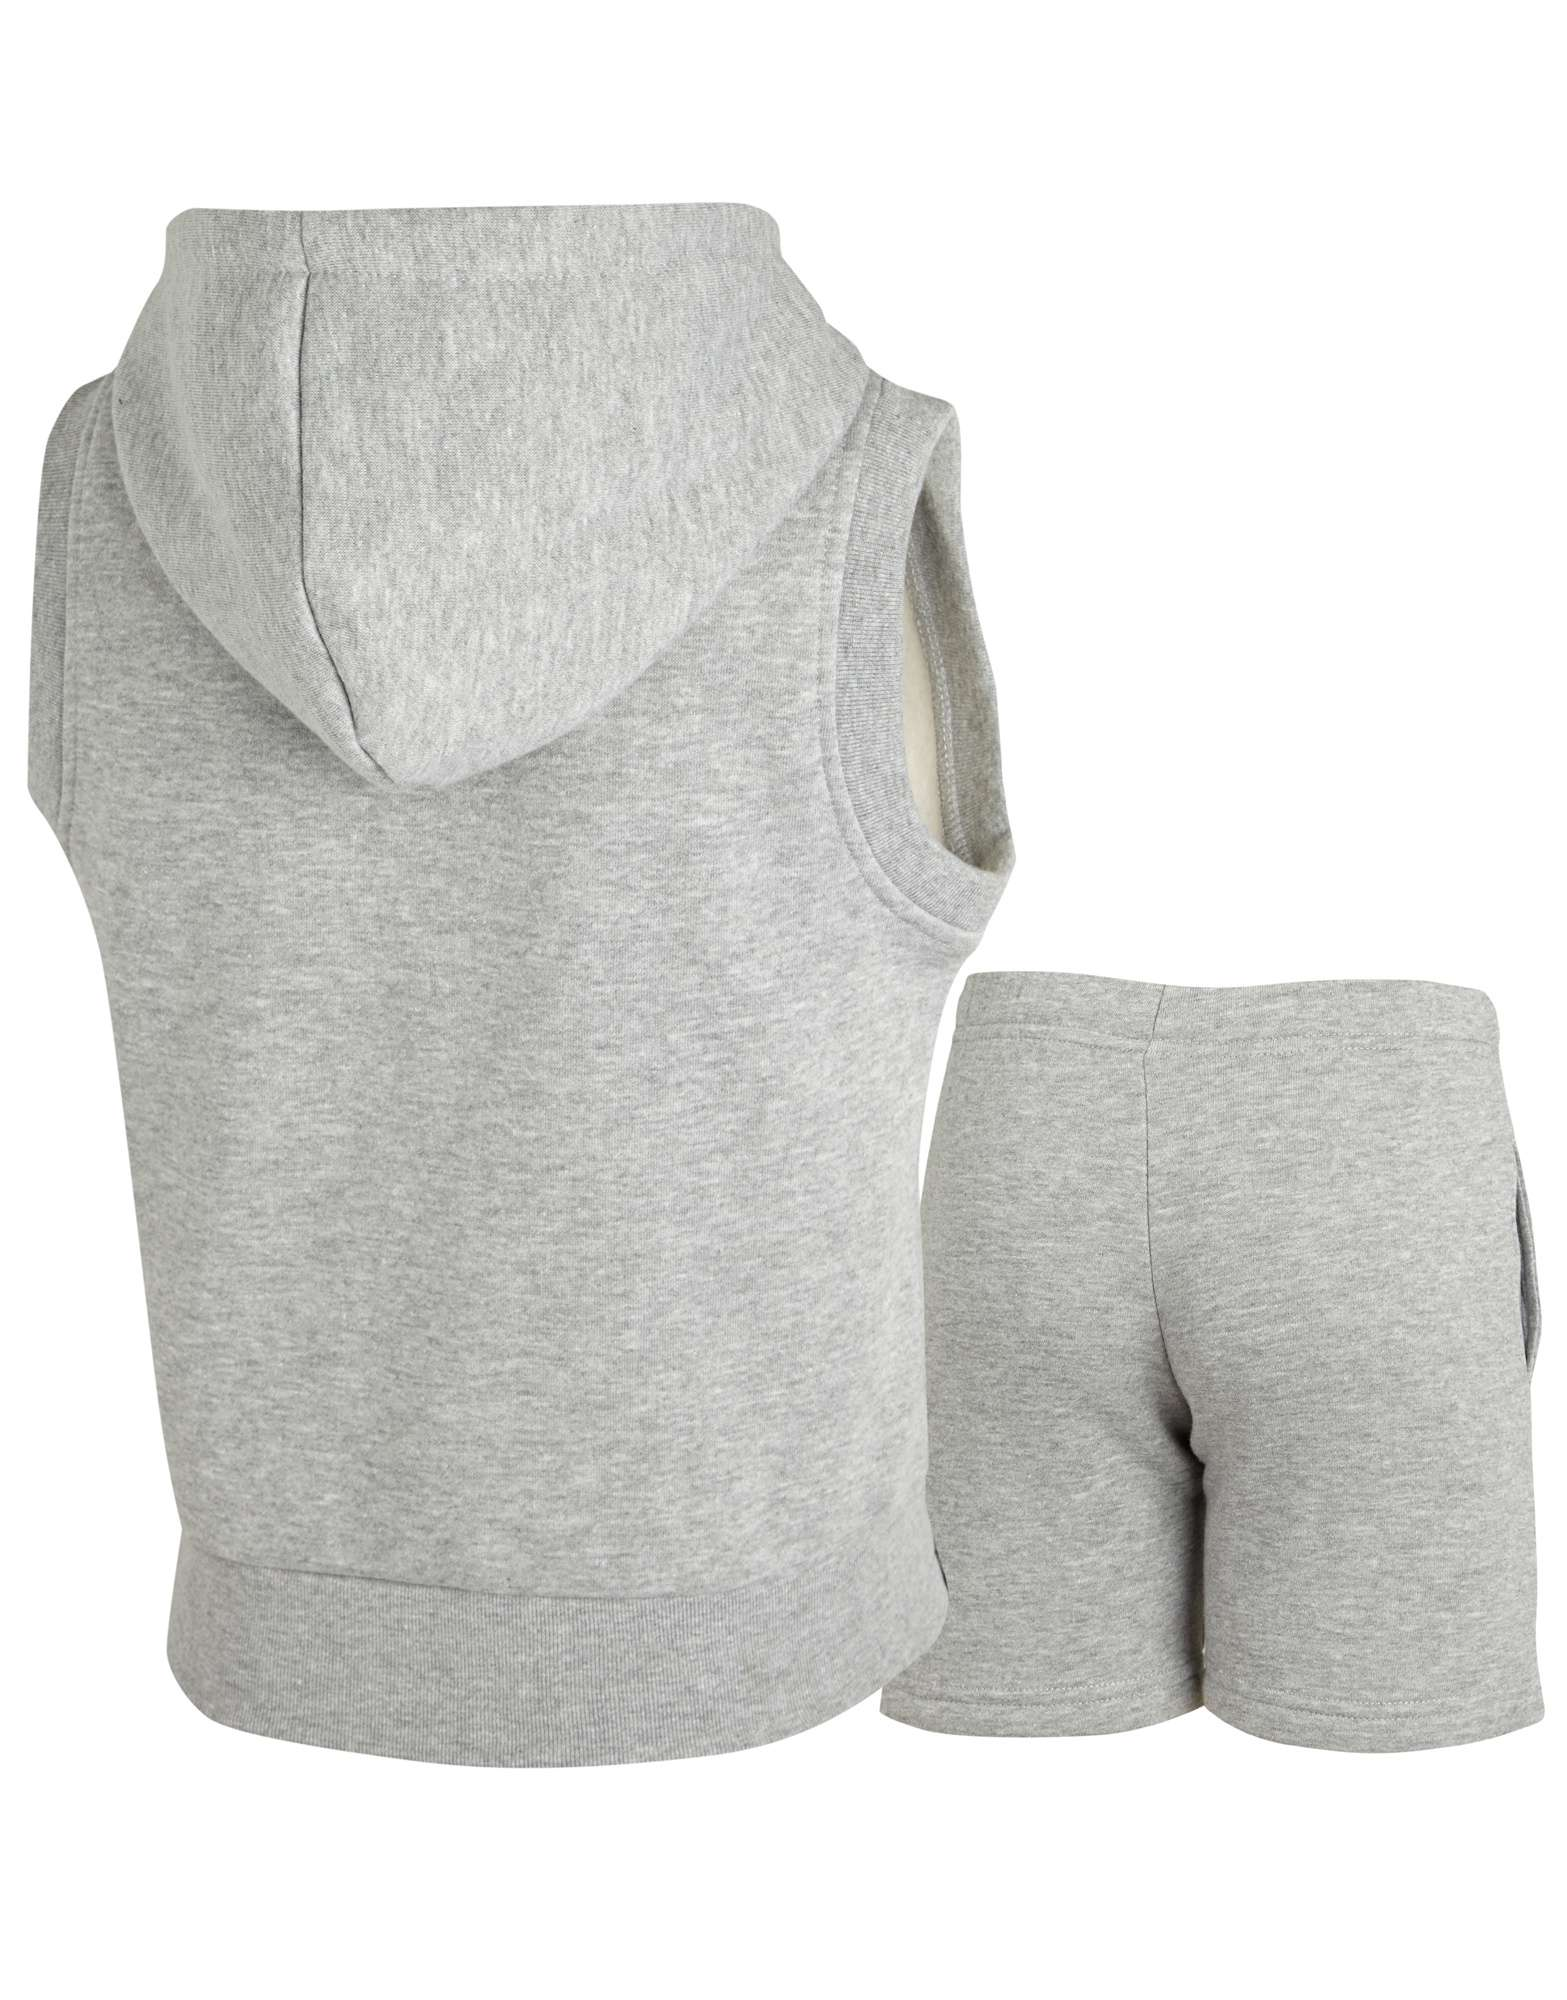 Carbrini Sleeveless Hoody and Shorts Set Childrens